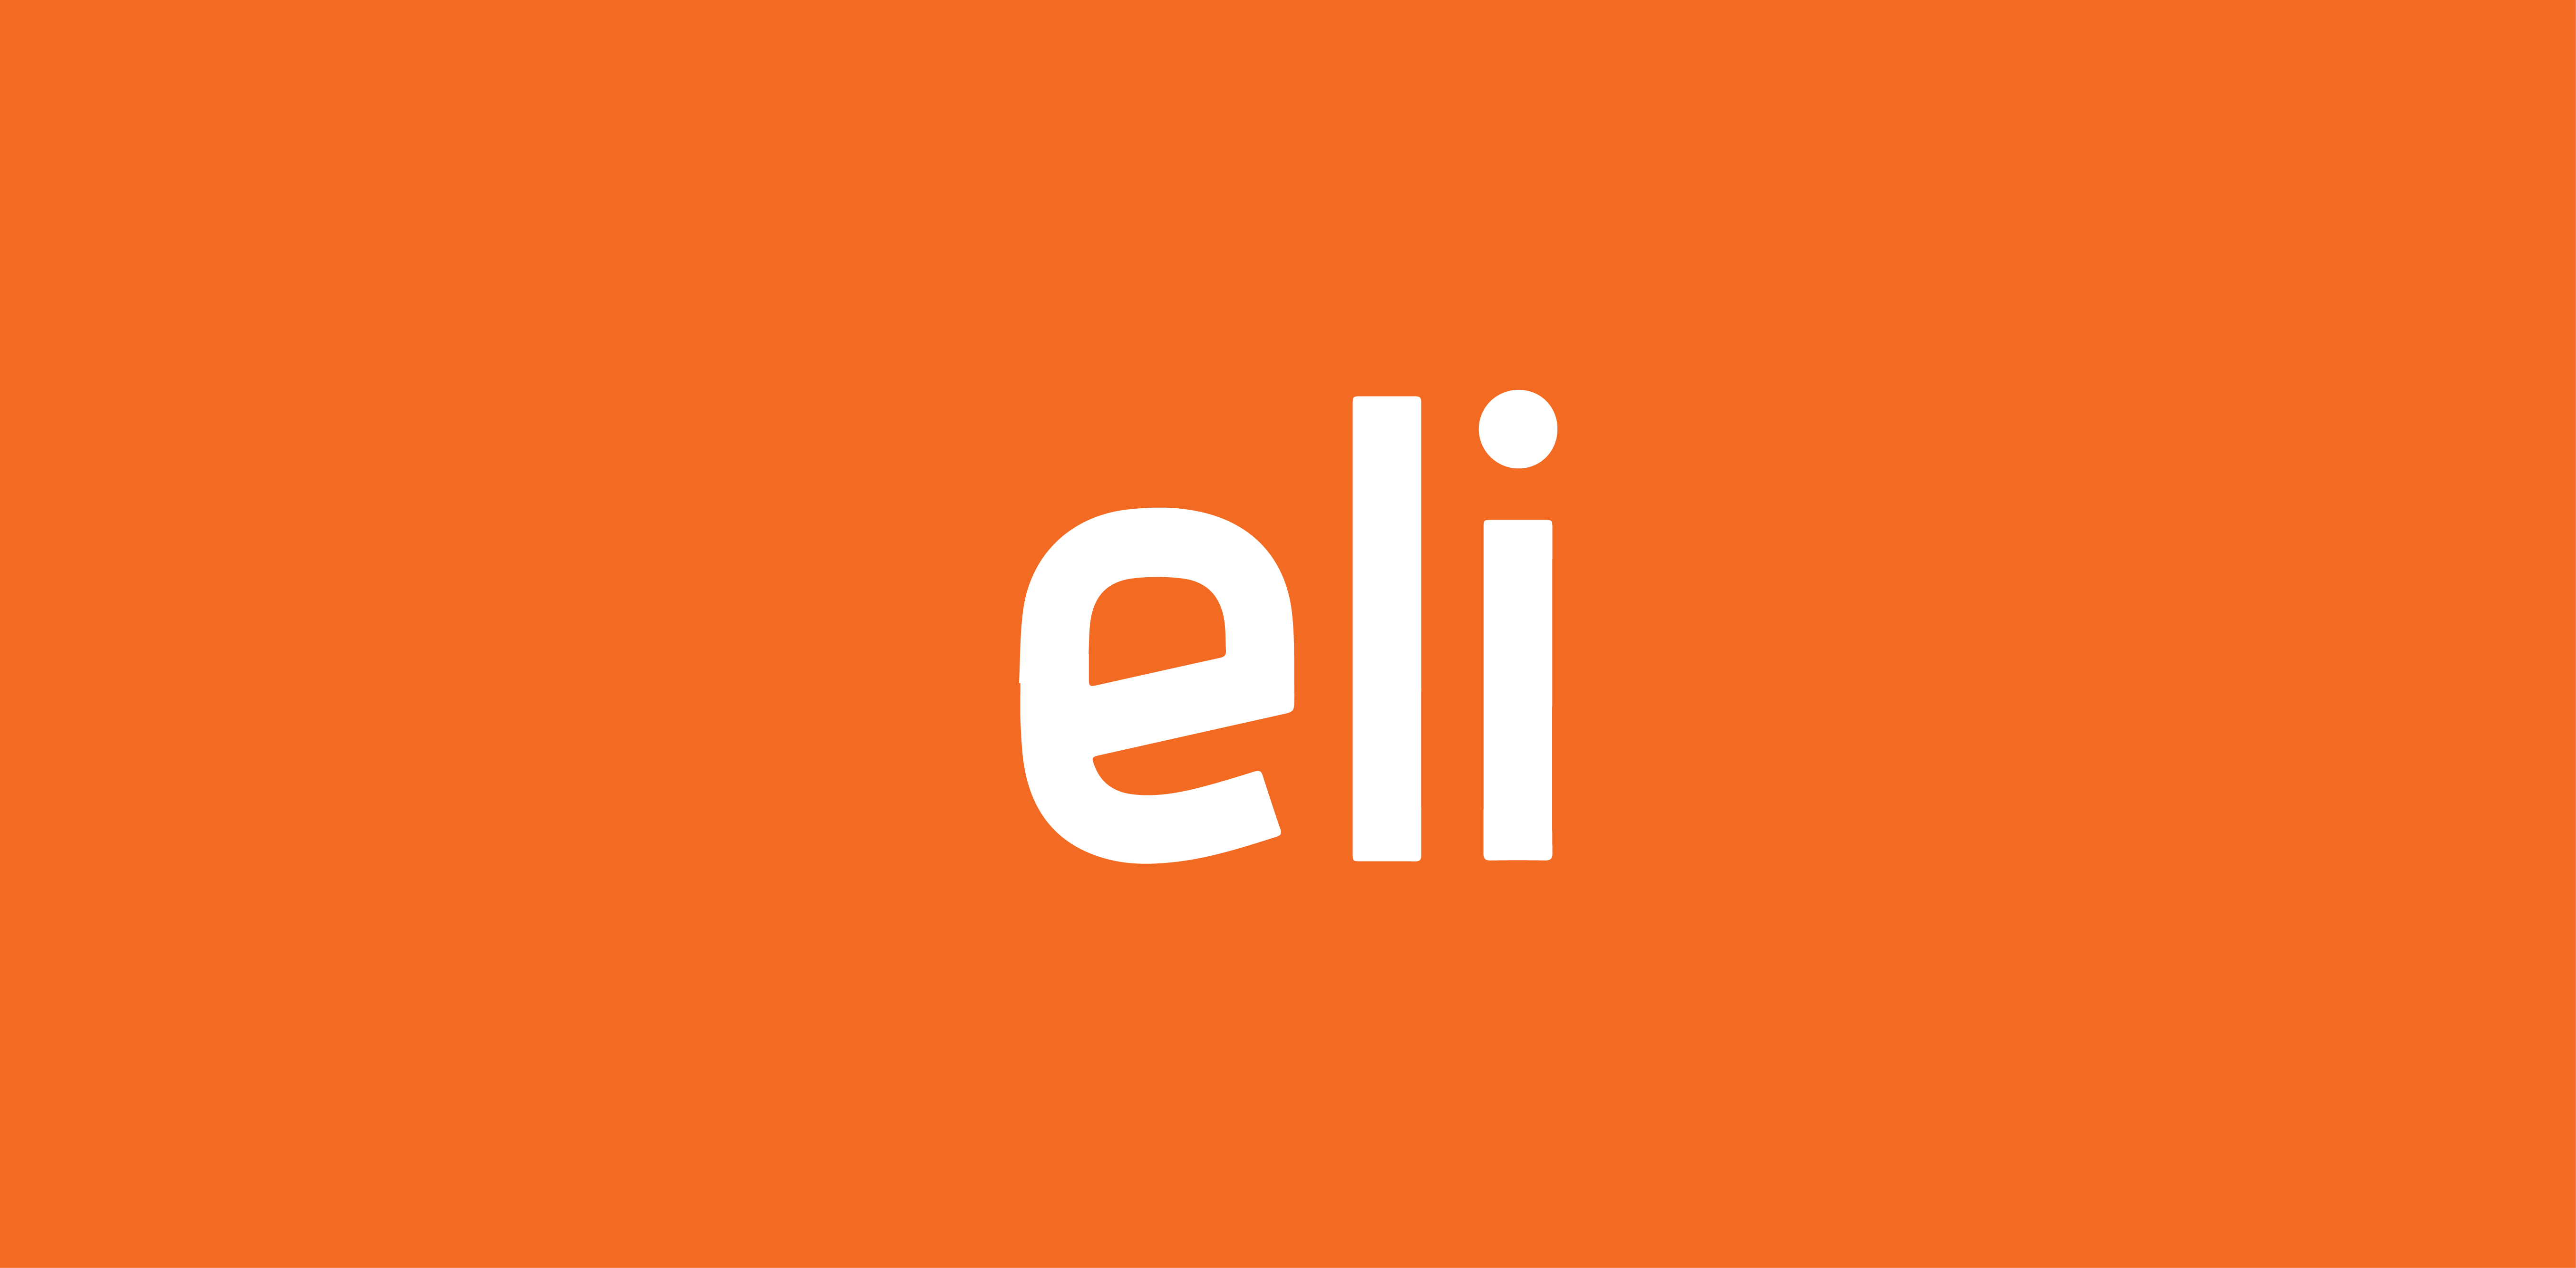 ELI_Fond_orange